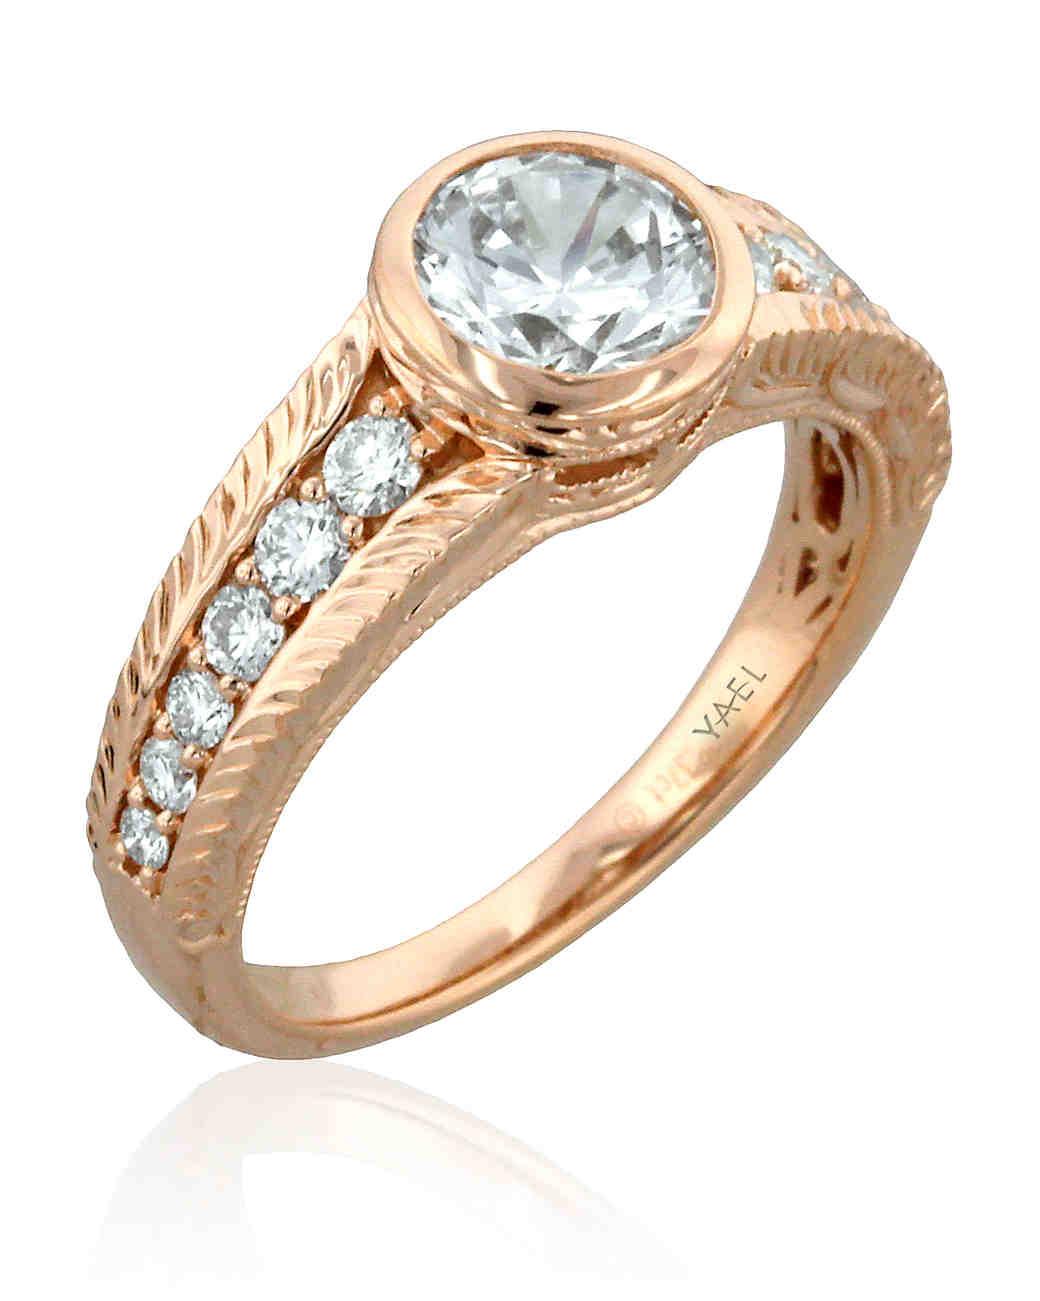 Yael Designs Brilliant-Cut Diamond Engagement Ring in Rose Gold